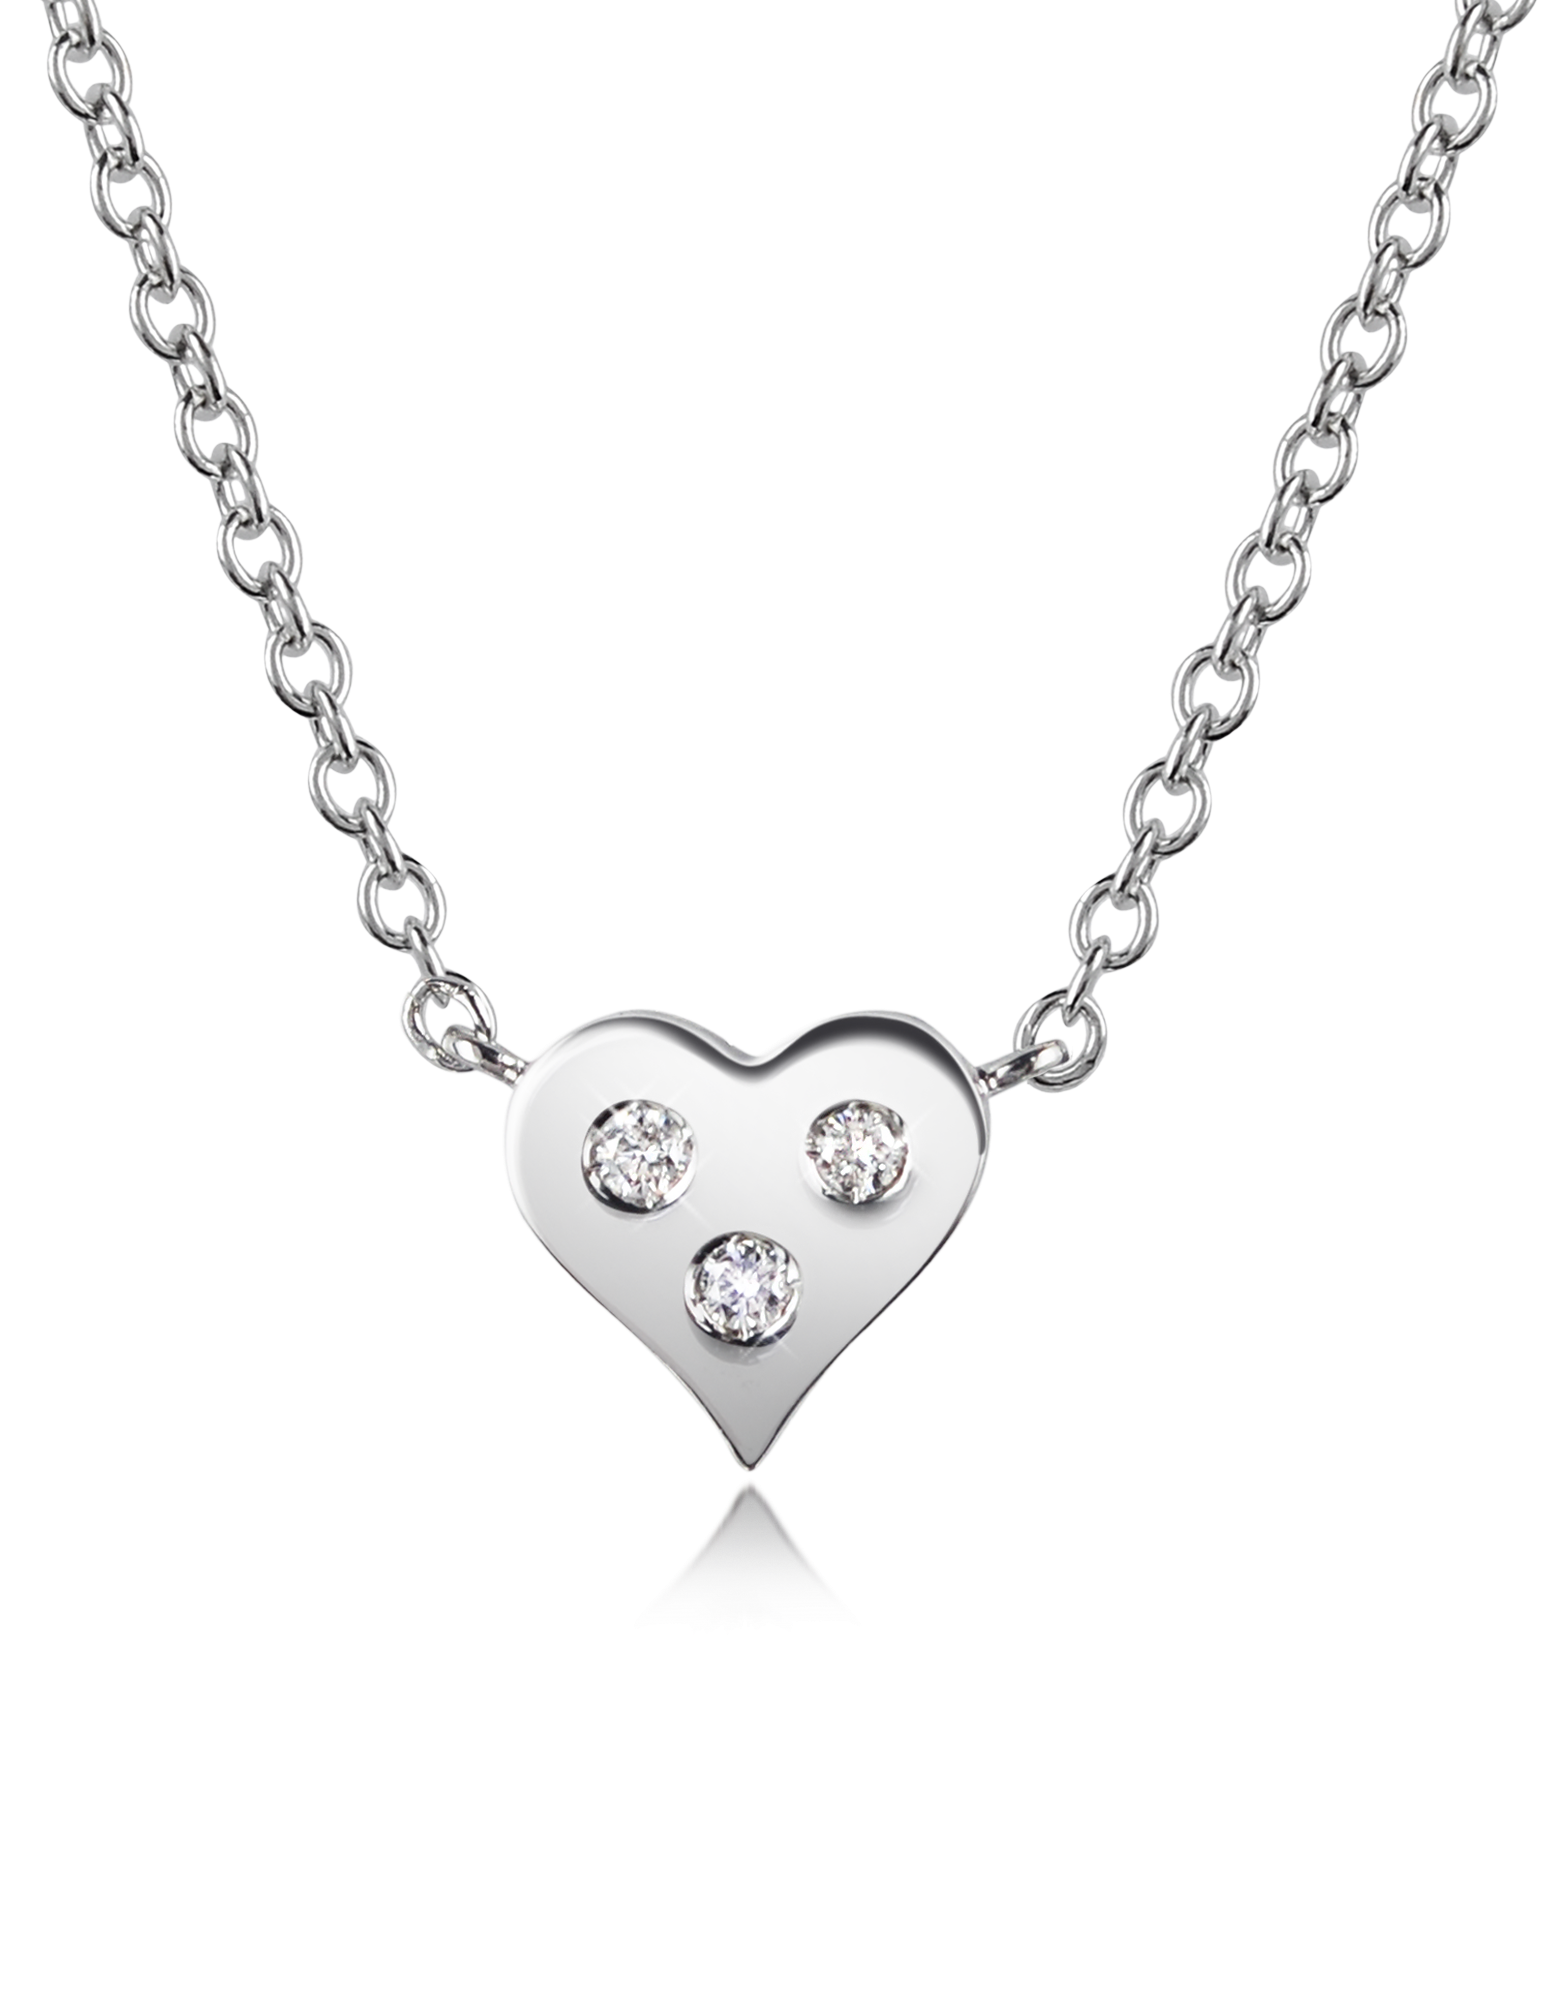 Image of 0.05 ct Diamond Heart Pendant Necklace